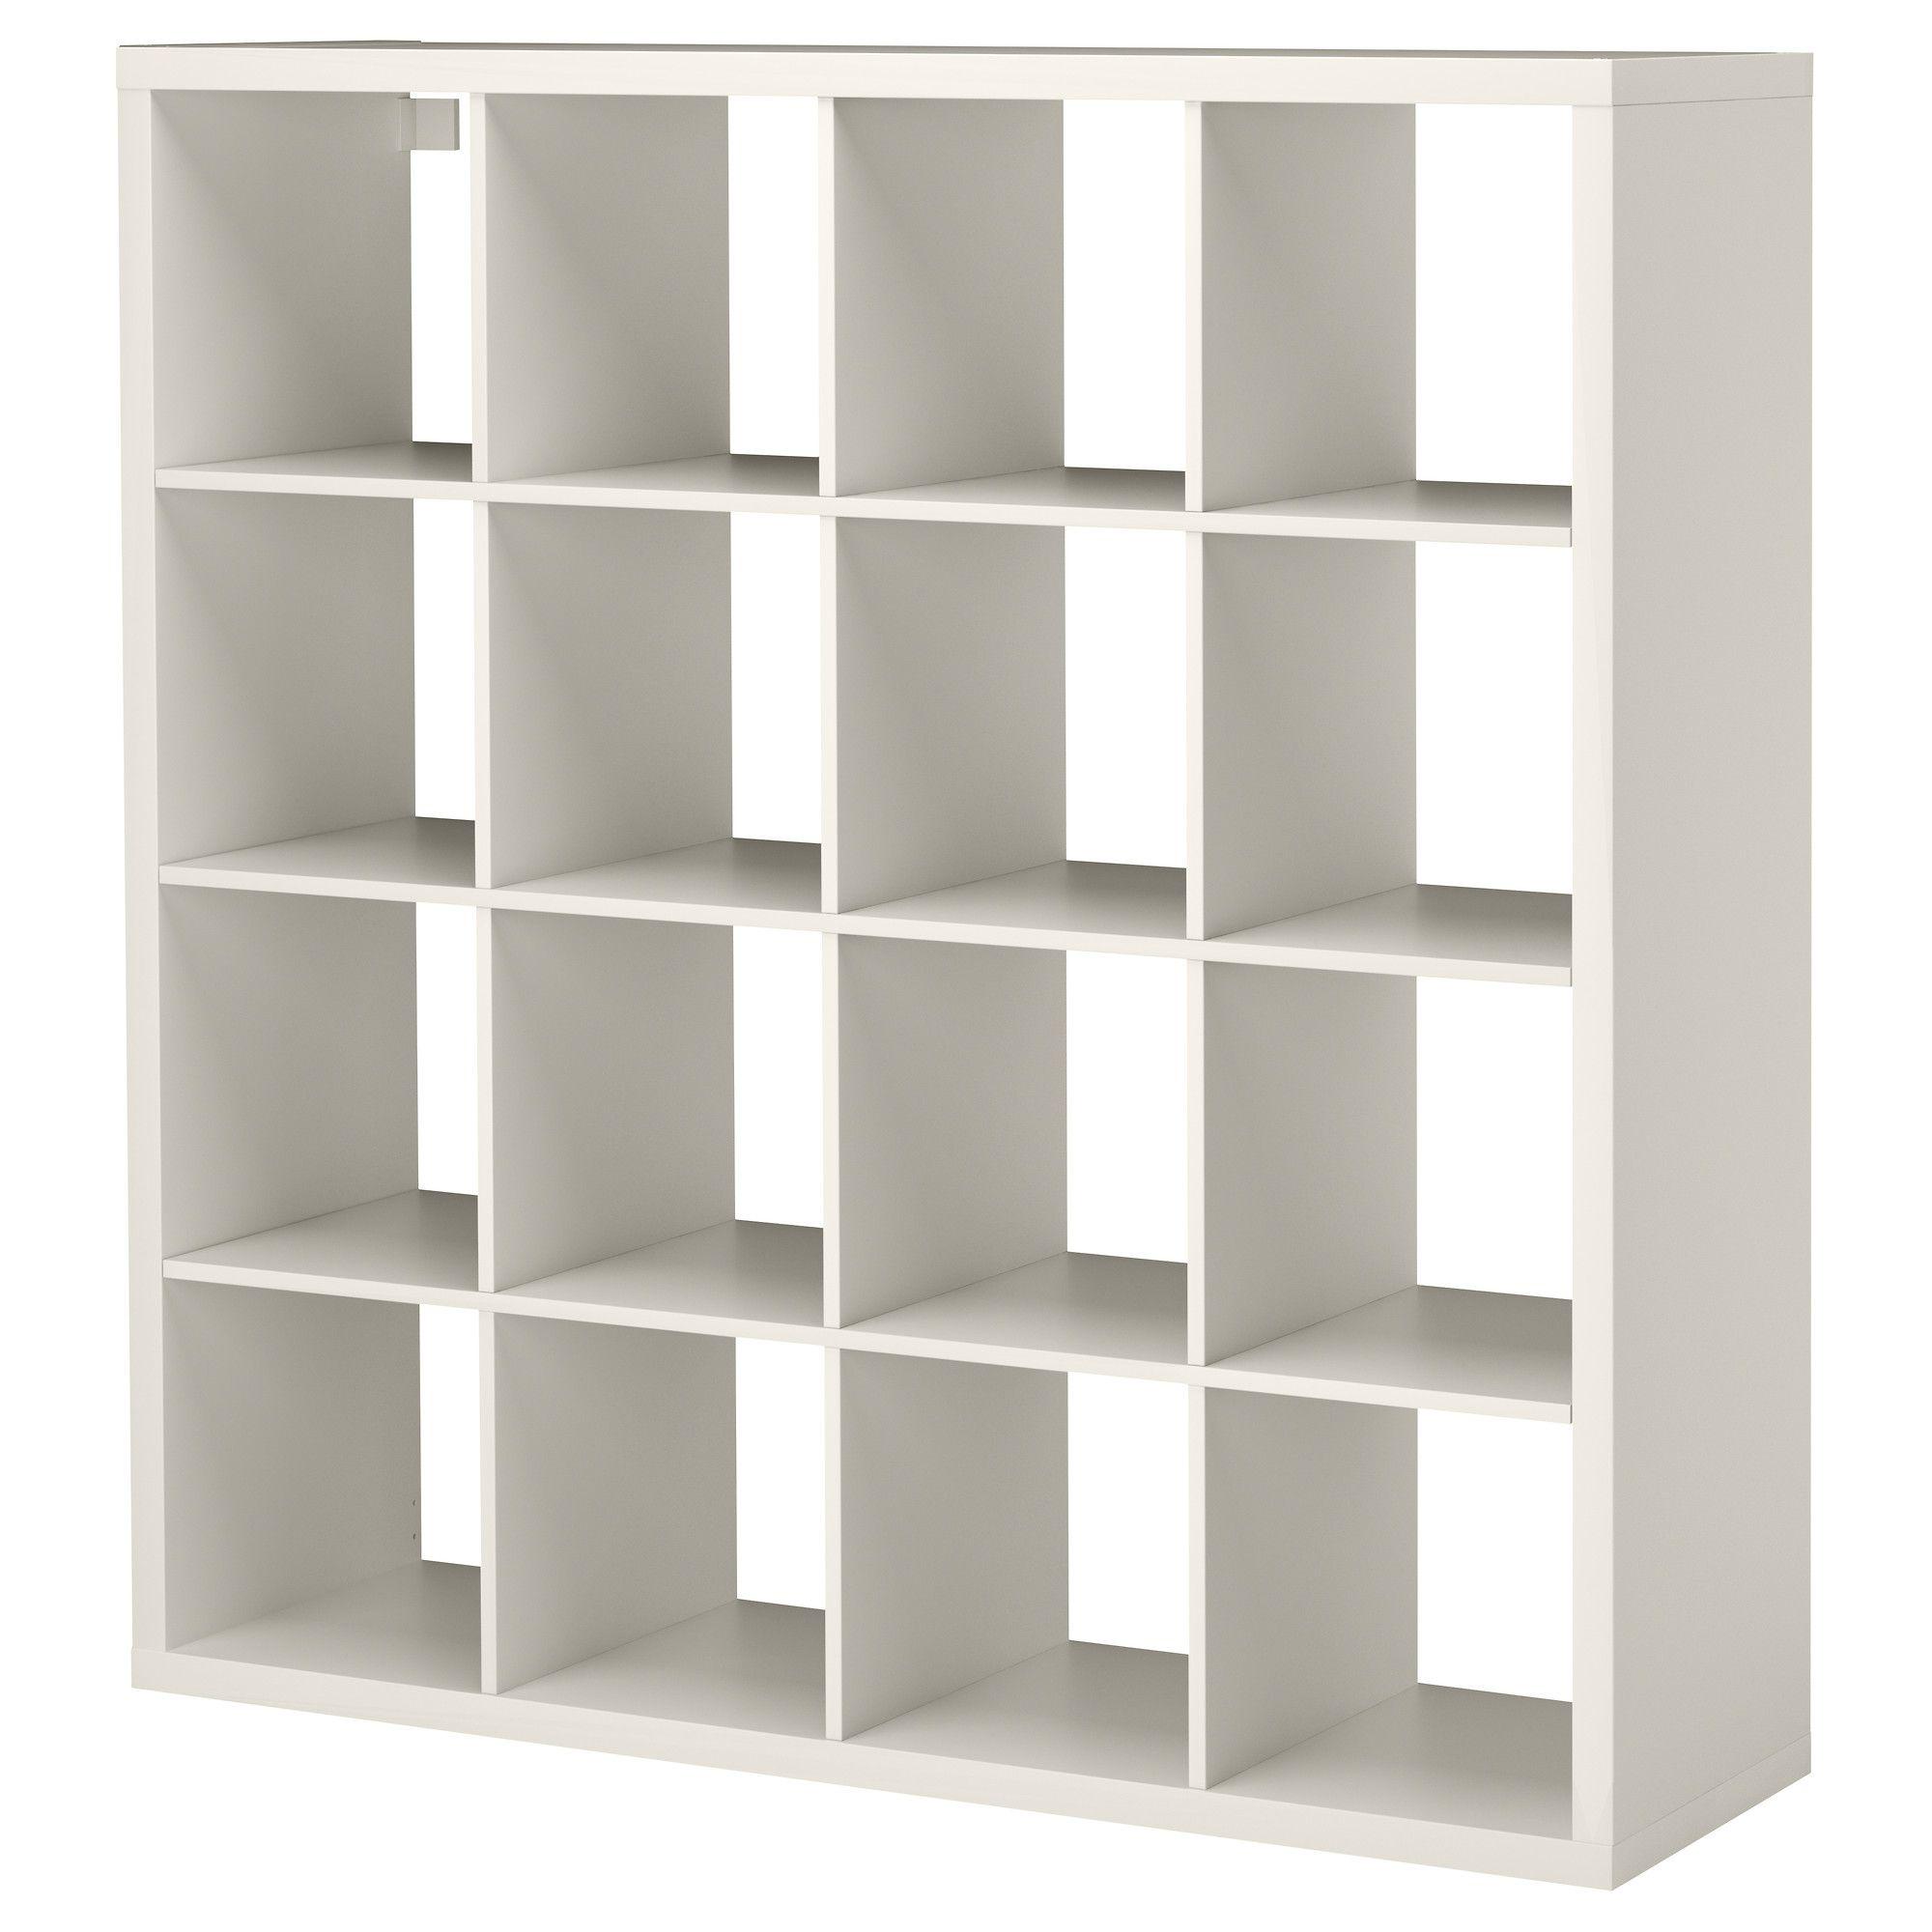 Awesome Etagere 8 Cases Ikea #5: KALLAX Shelf Unit, White